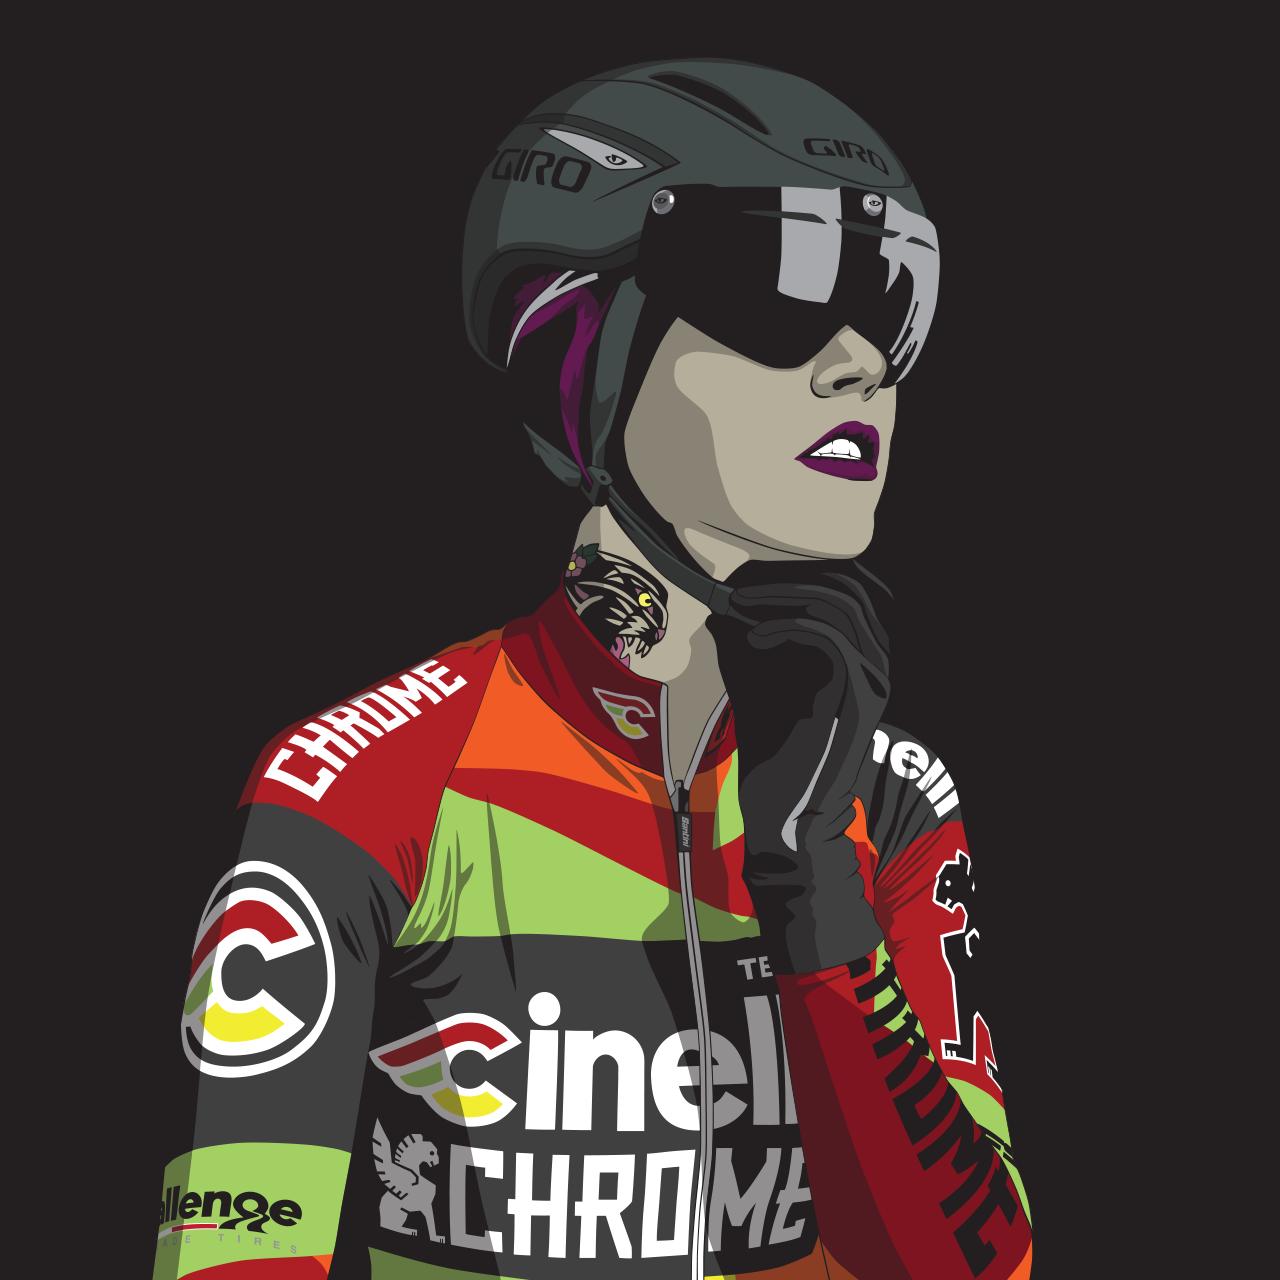 Kelli Samuelson from Team Cinelli Chrome. Illustration by JIMONCO. Original photo by Meg McMahon.